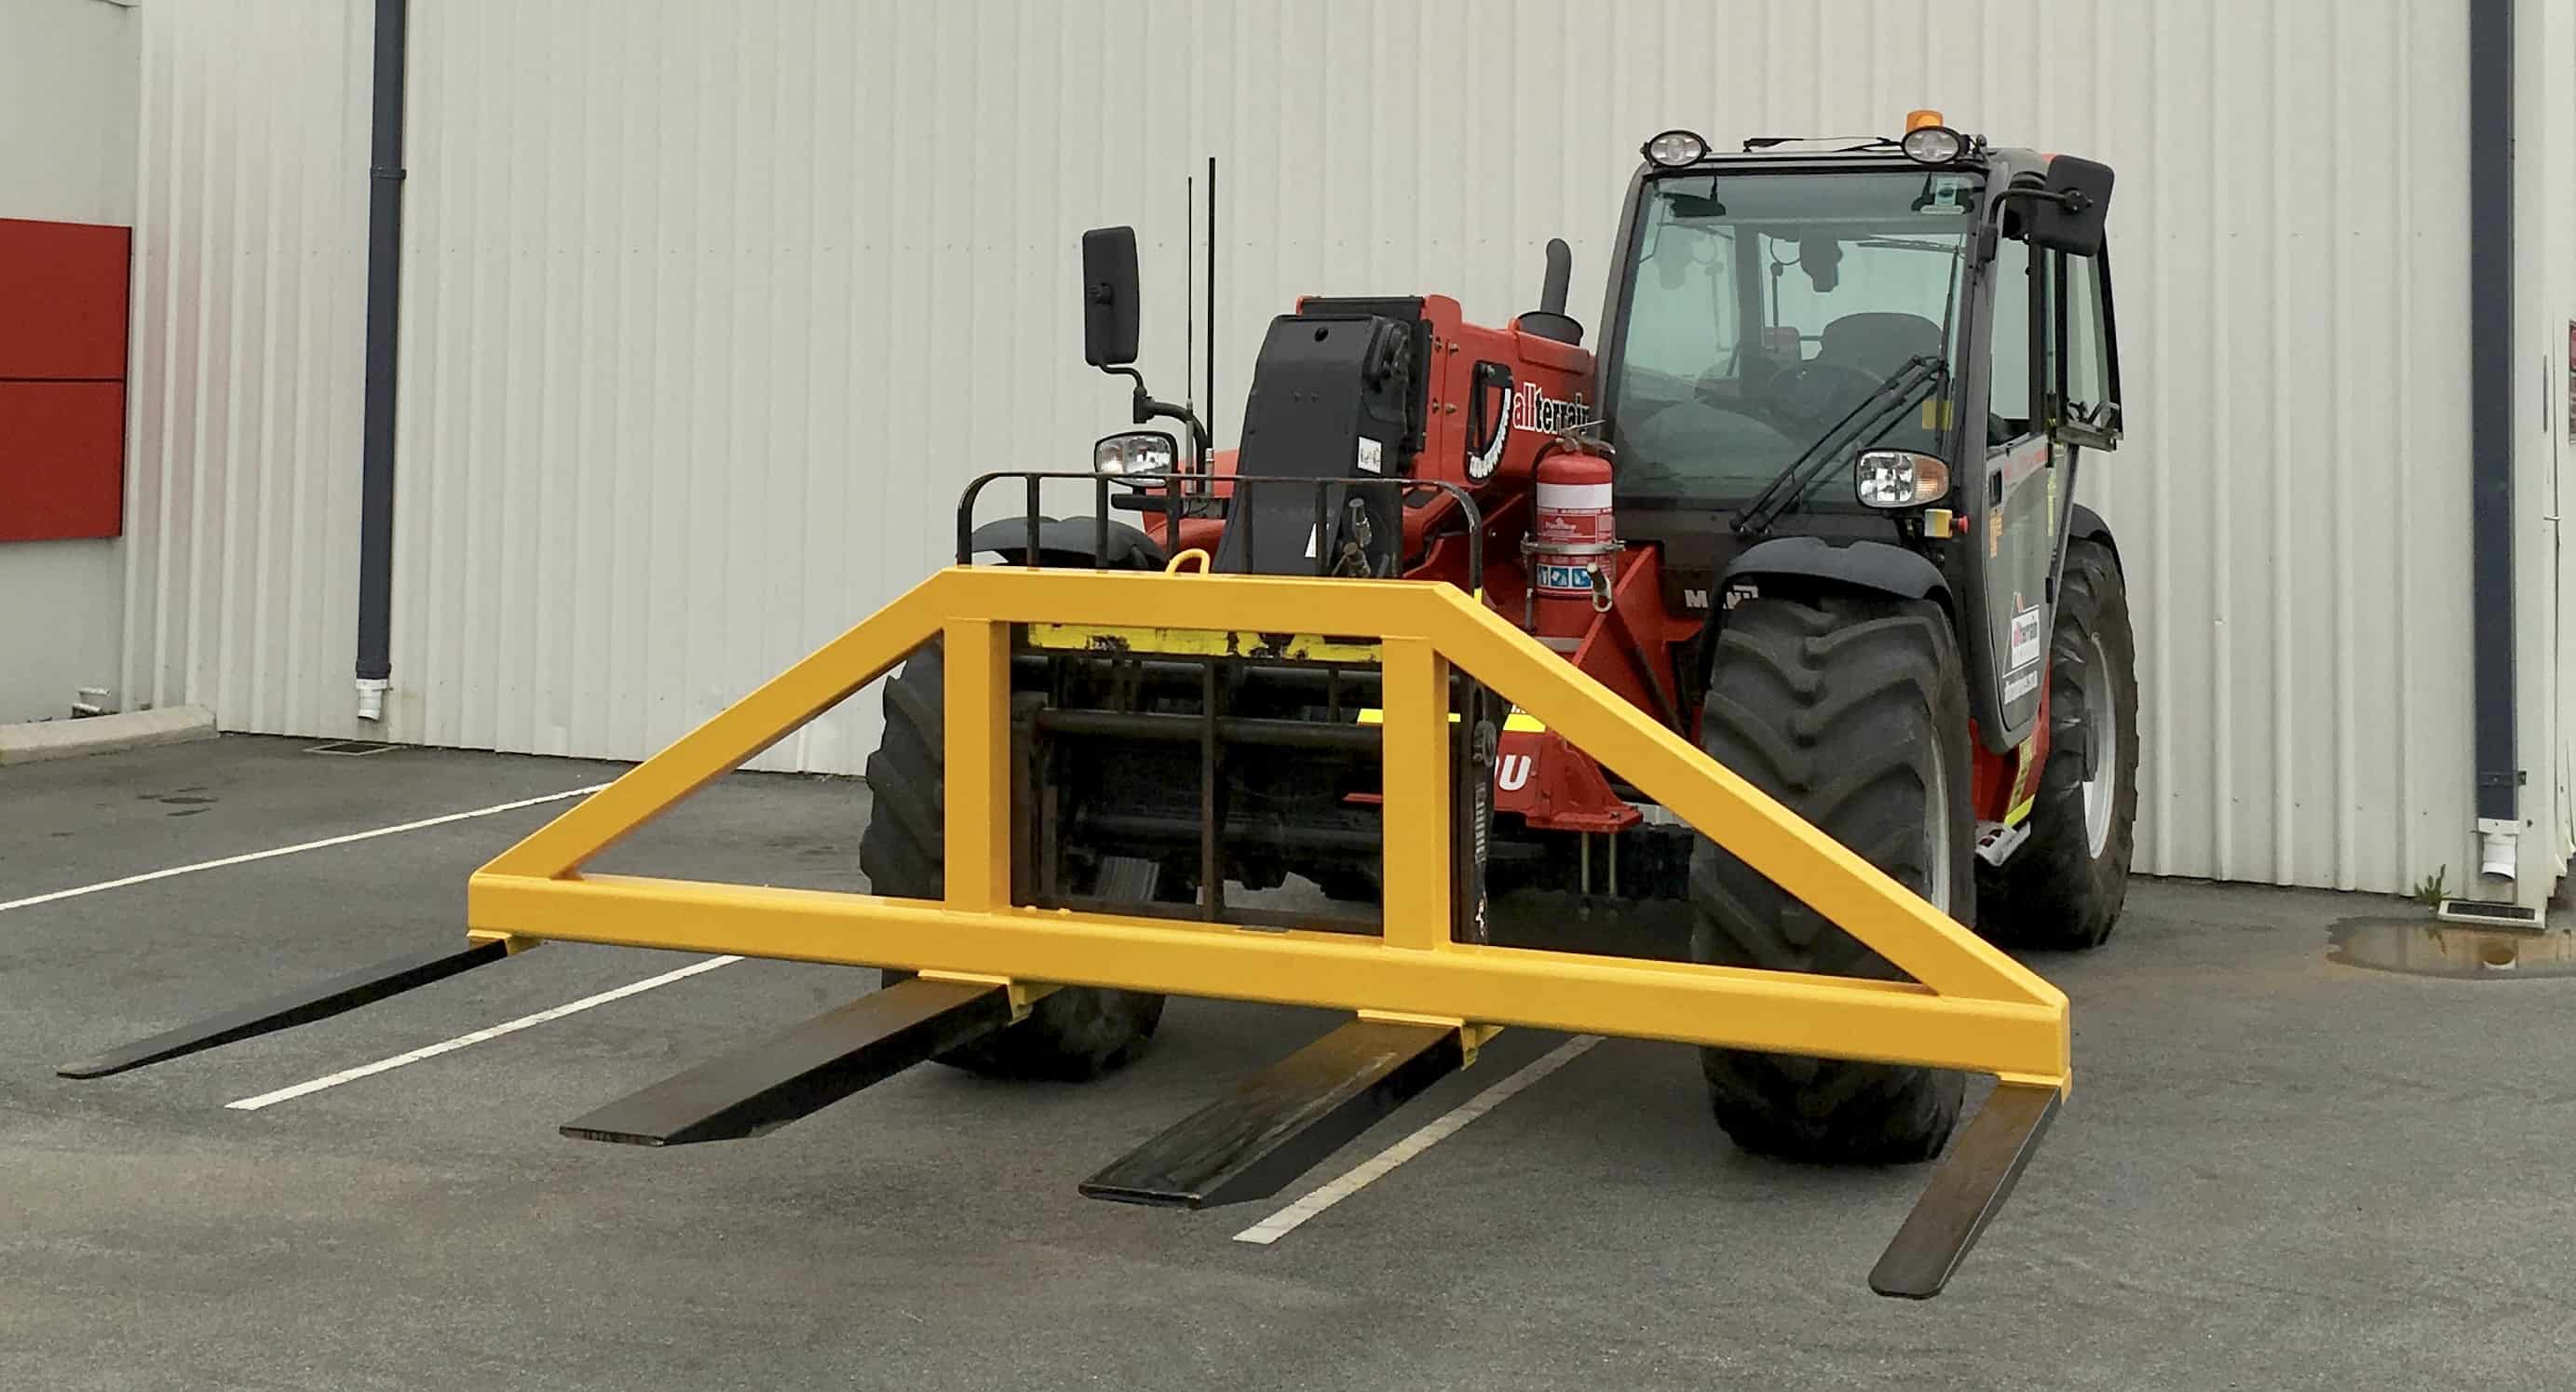 all-terrain-services-forklift-service-perth-handling-spreader-extension